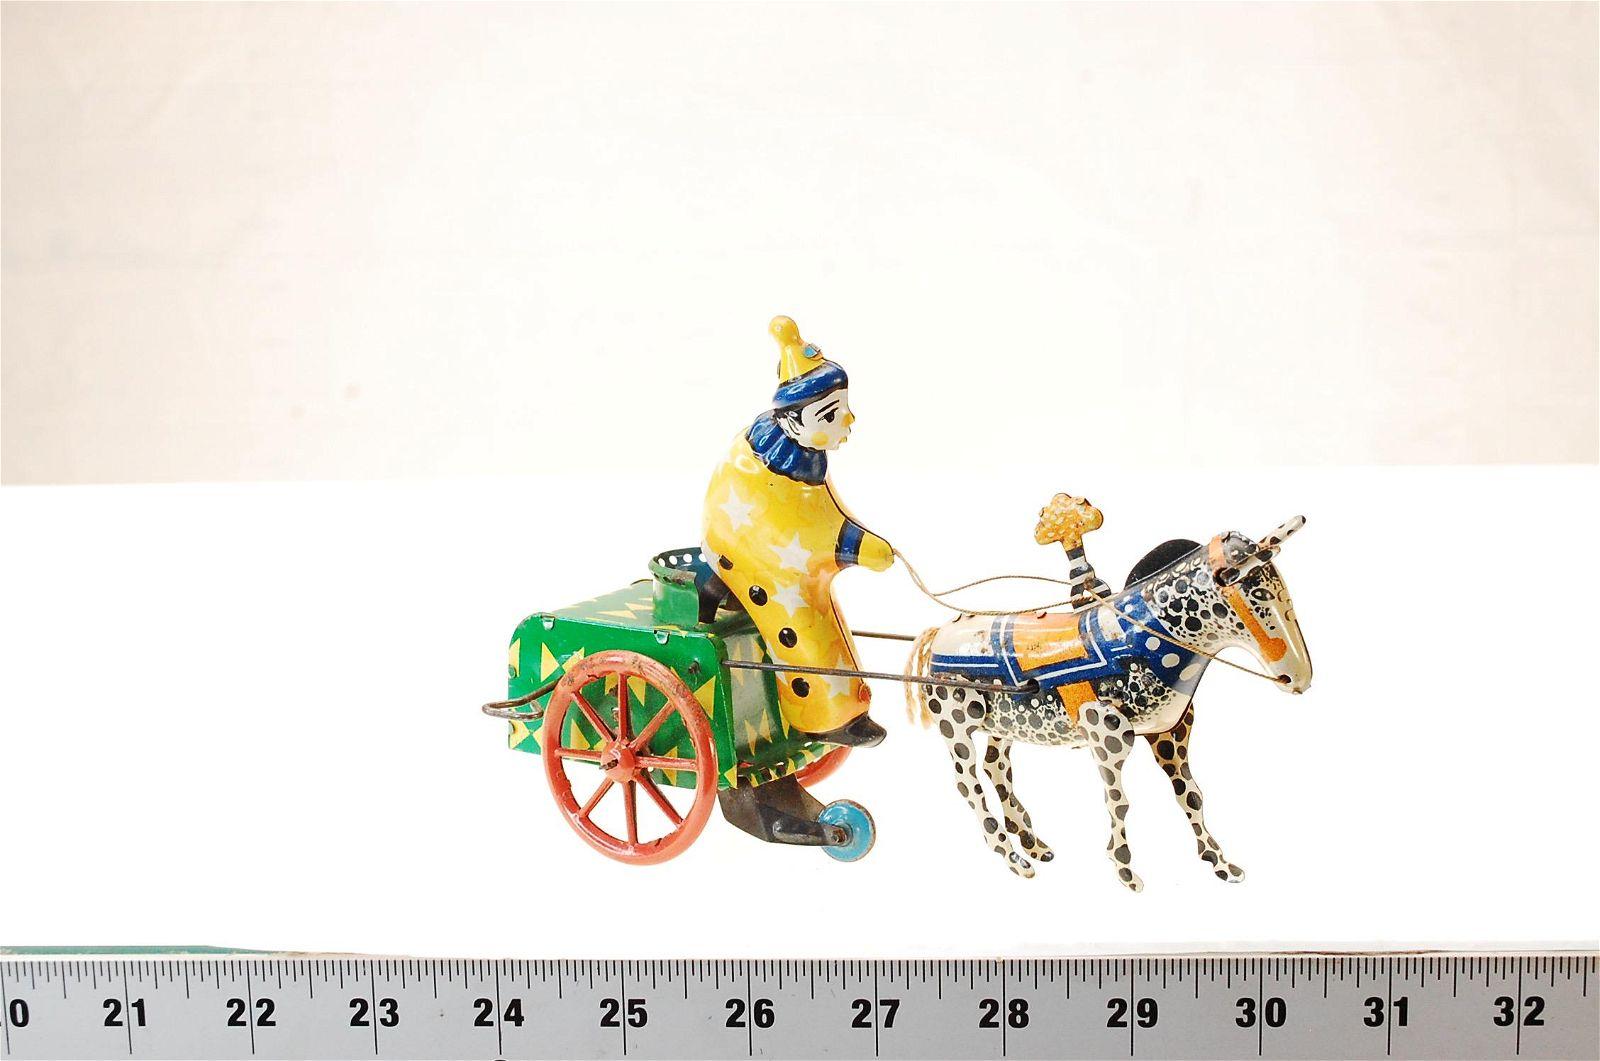 Antique Rare Old Wind-up Tin Toy Circus Clown Horseman